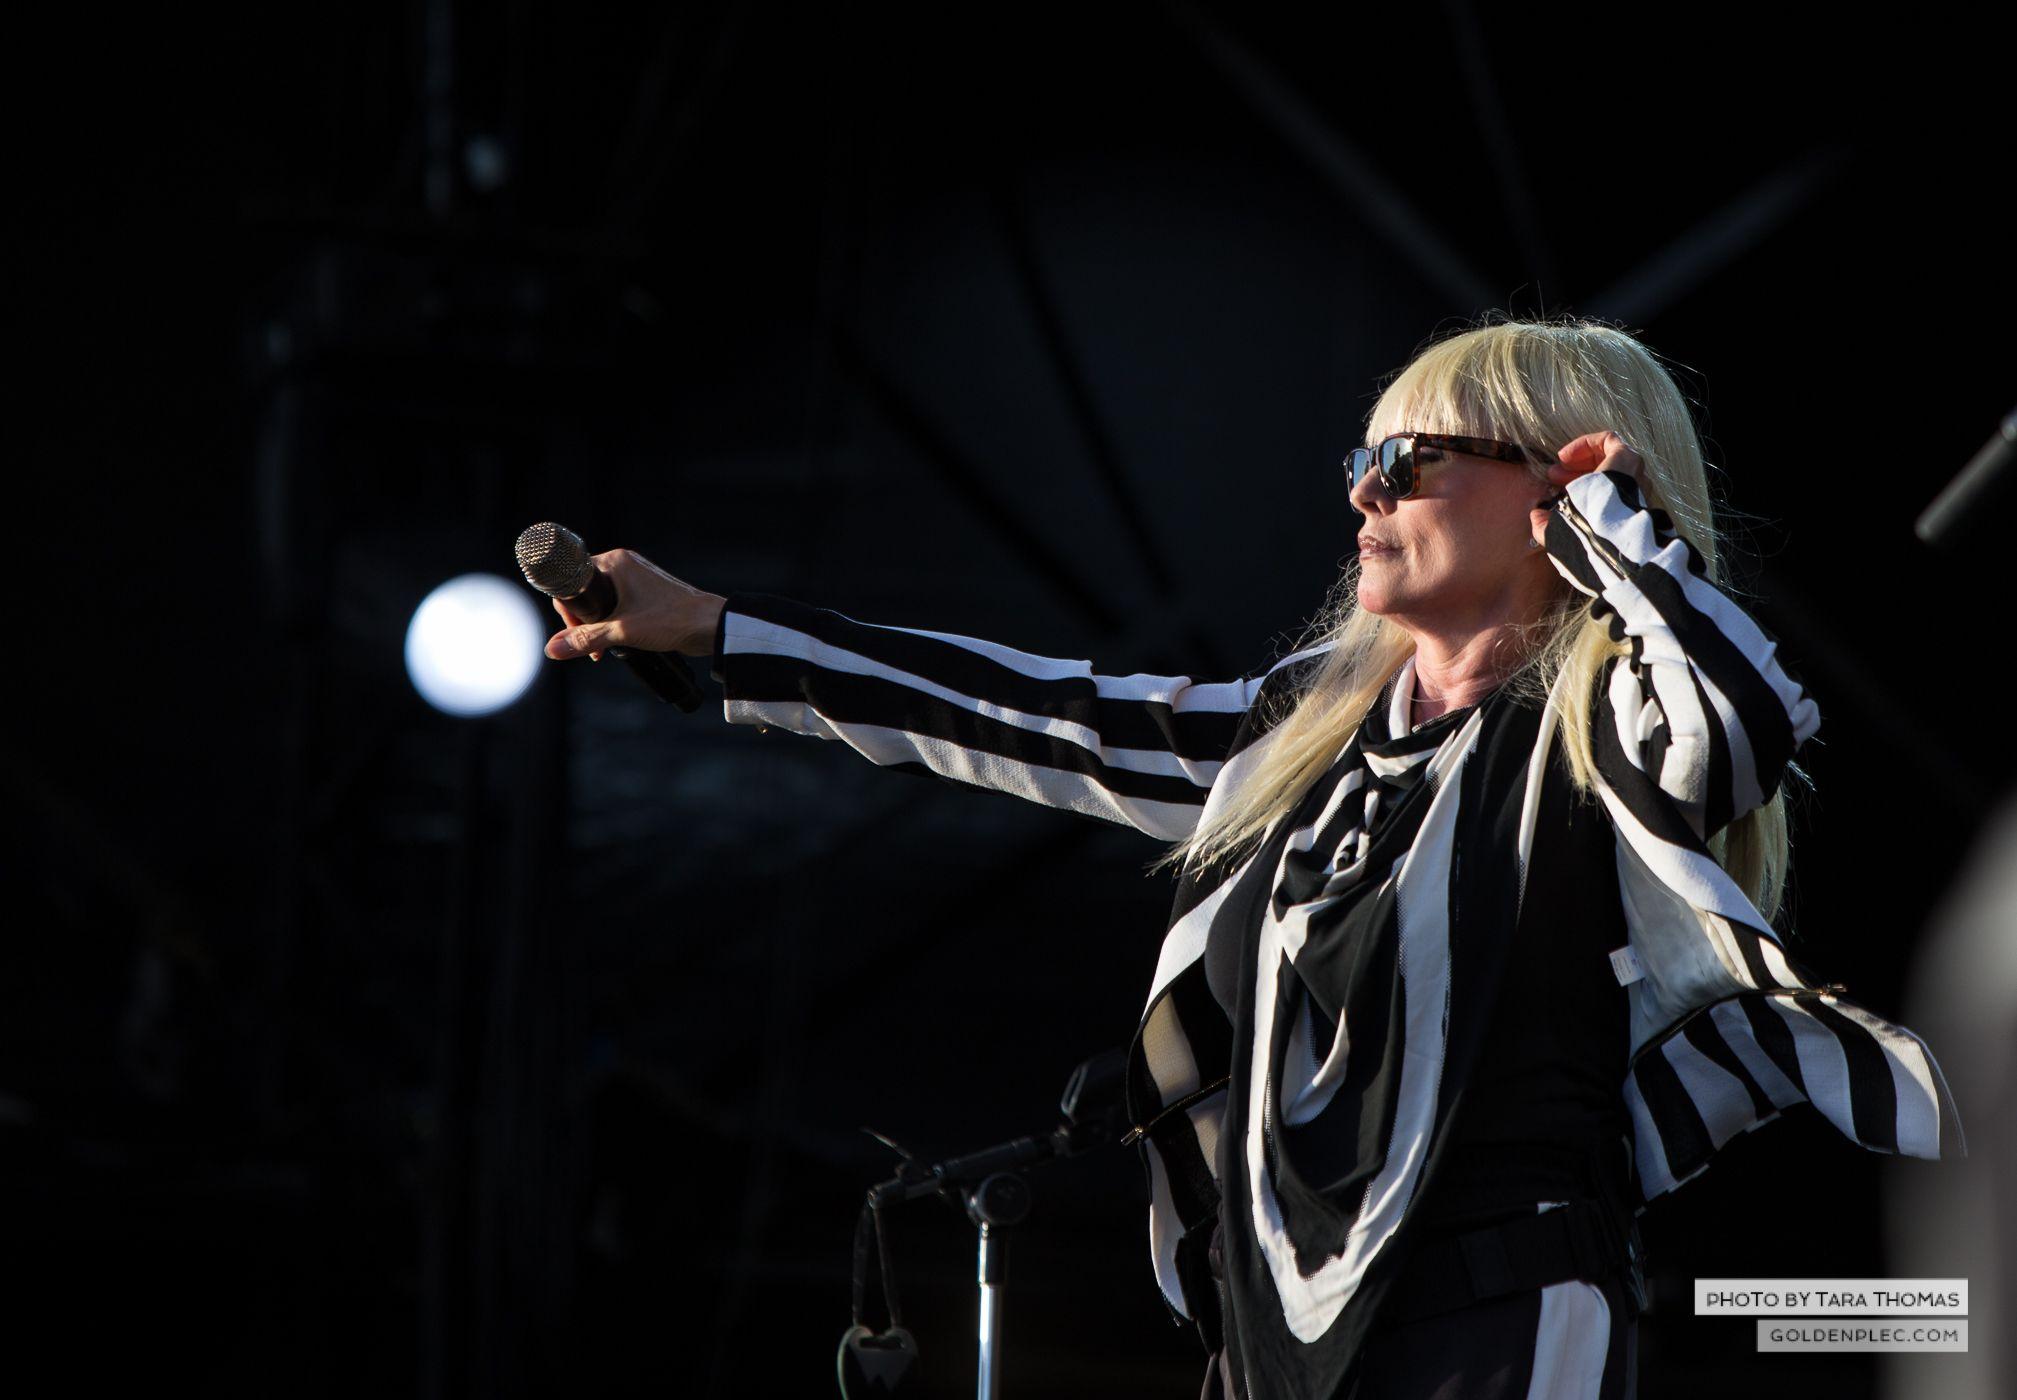 Blondie at Electric Picnic by Tara Thomas